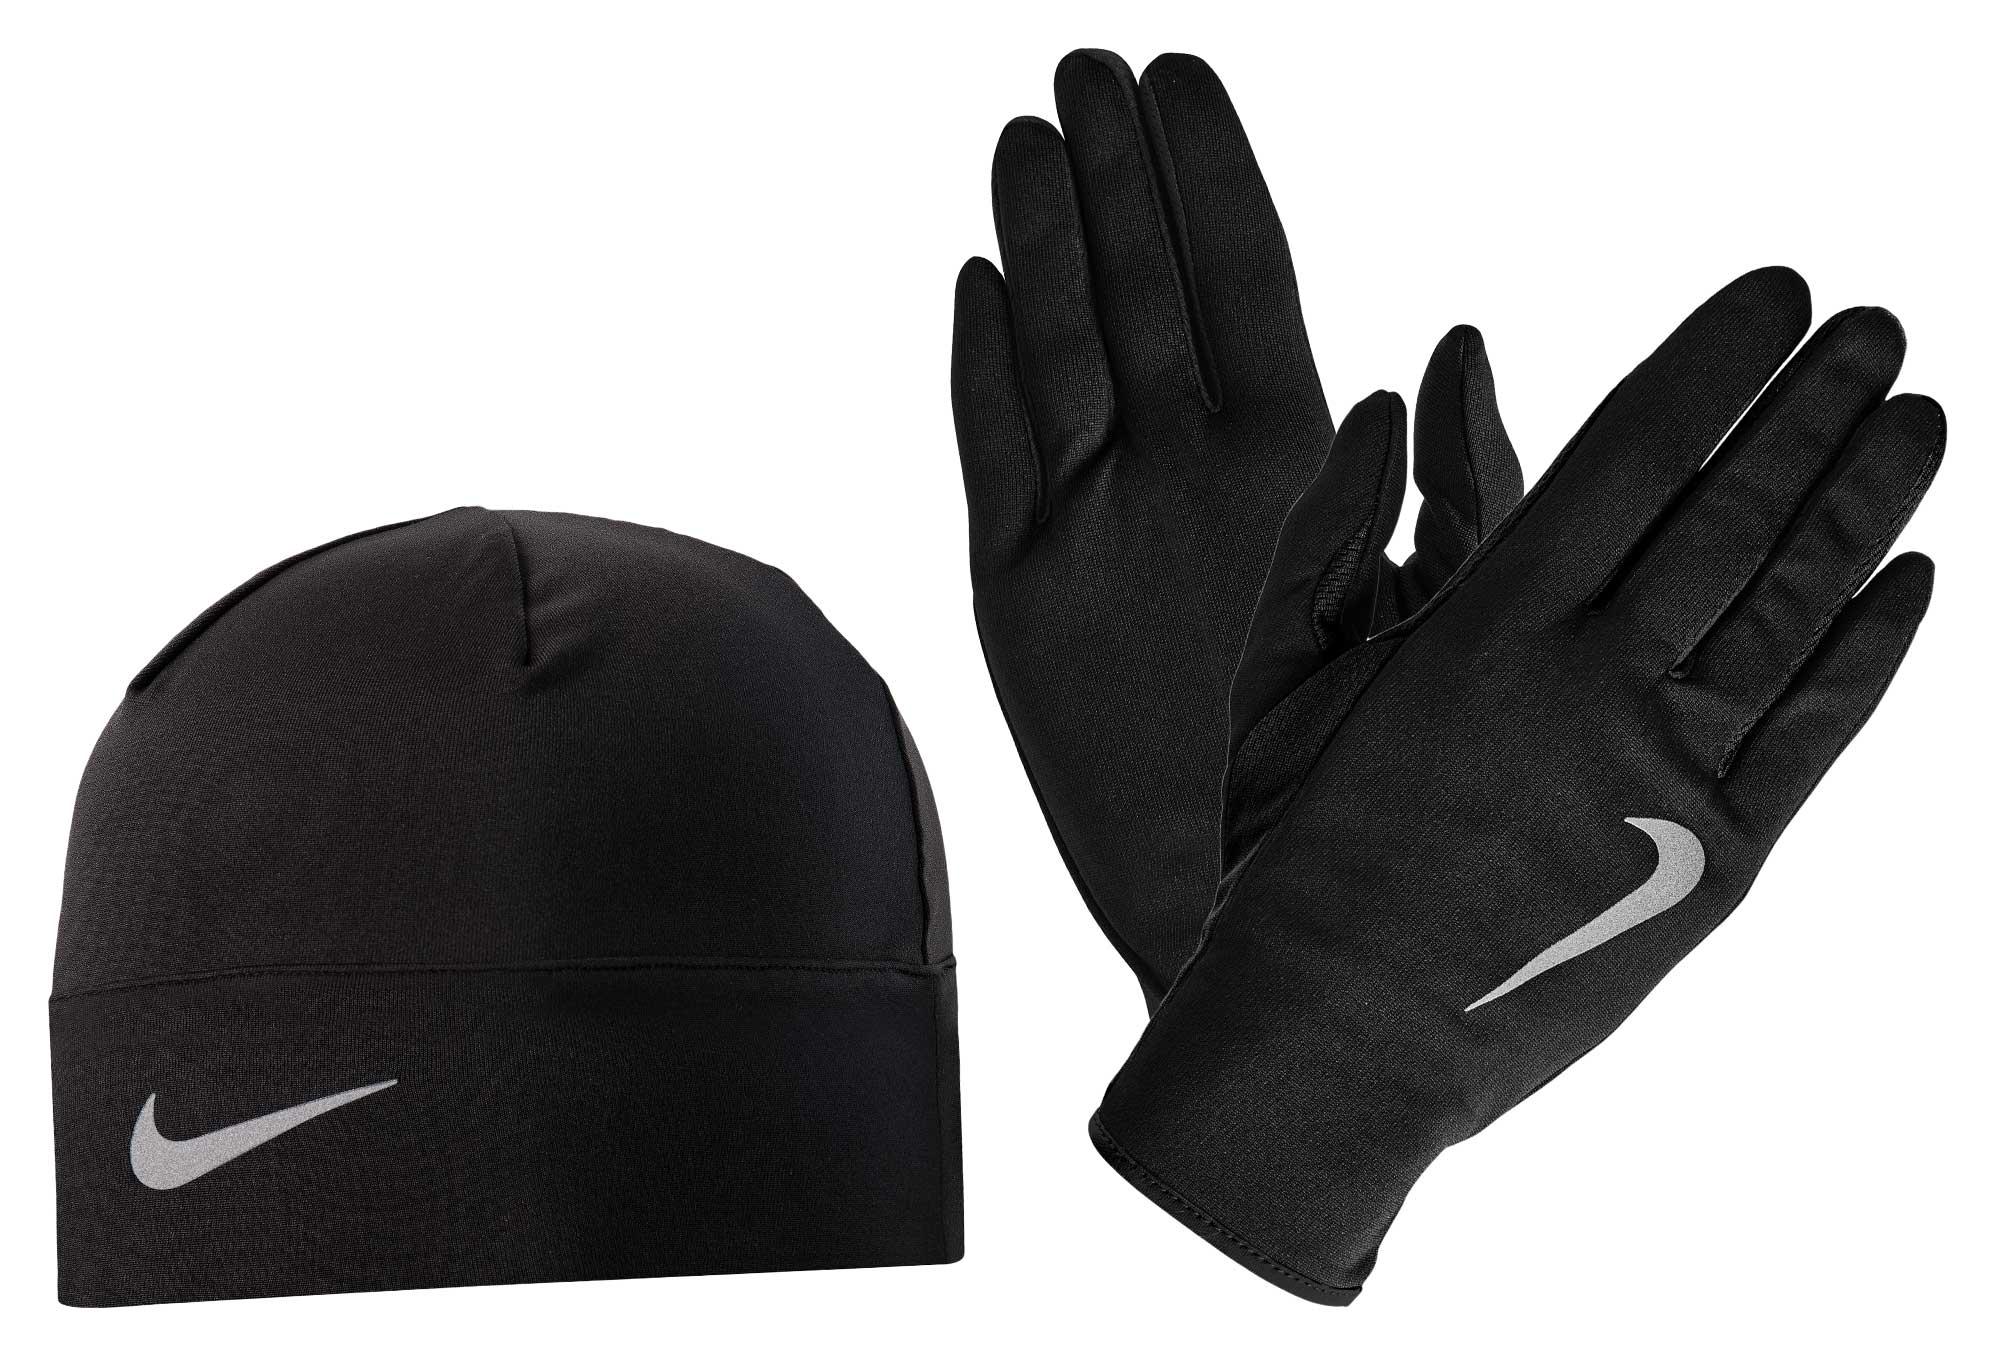 pack gants bonnet nike run dry noir. Black Bedroom Furniture Sets. Home Design Ideas